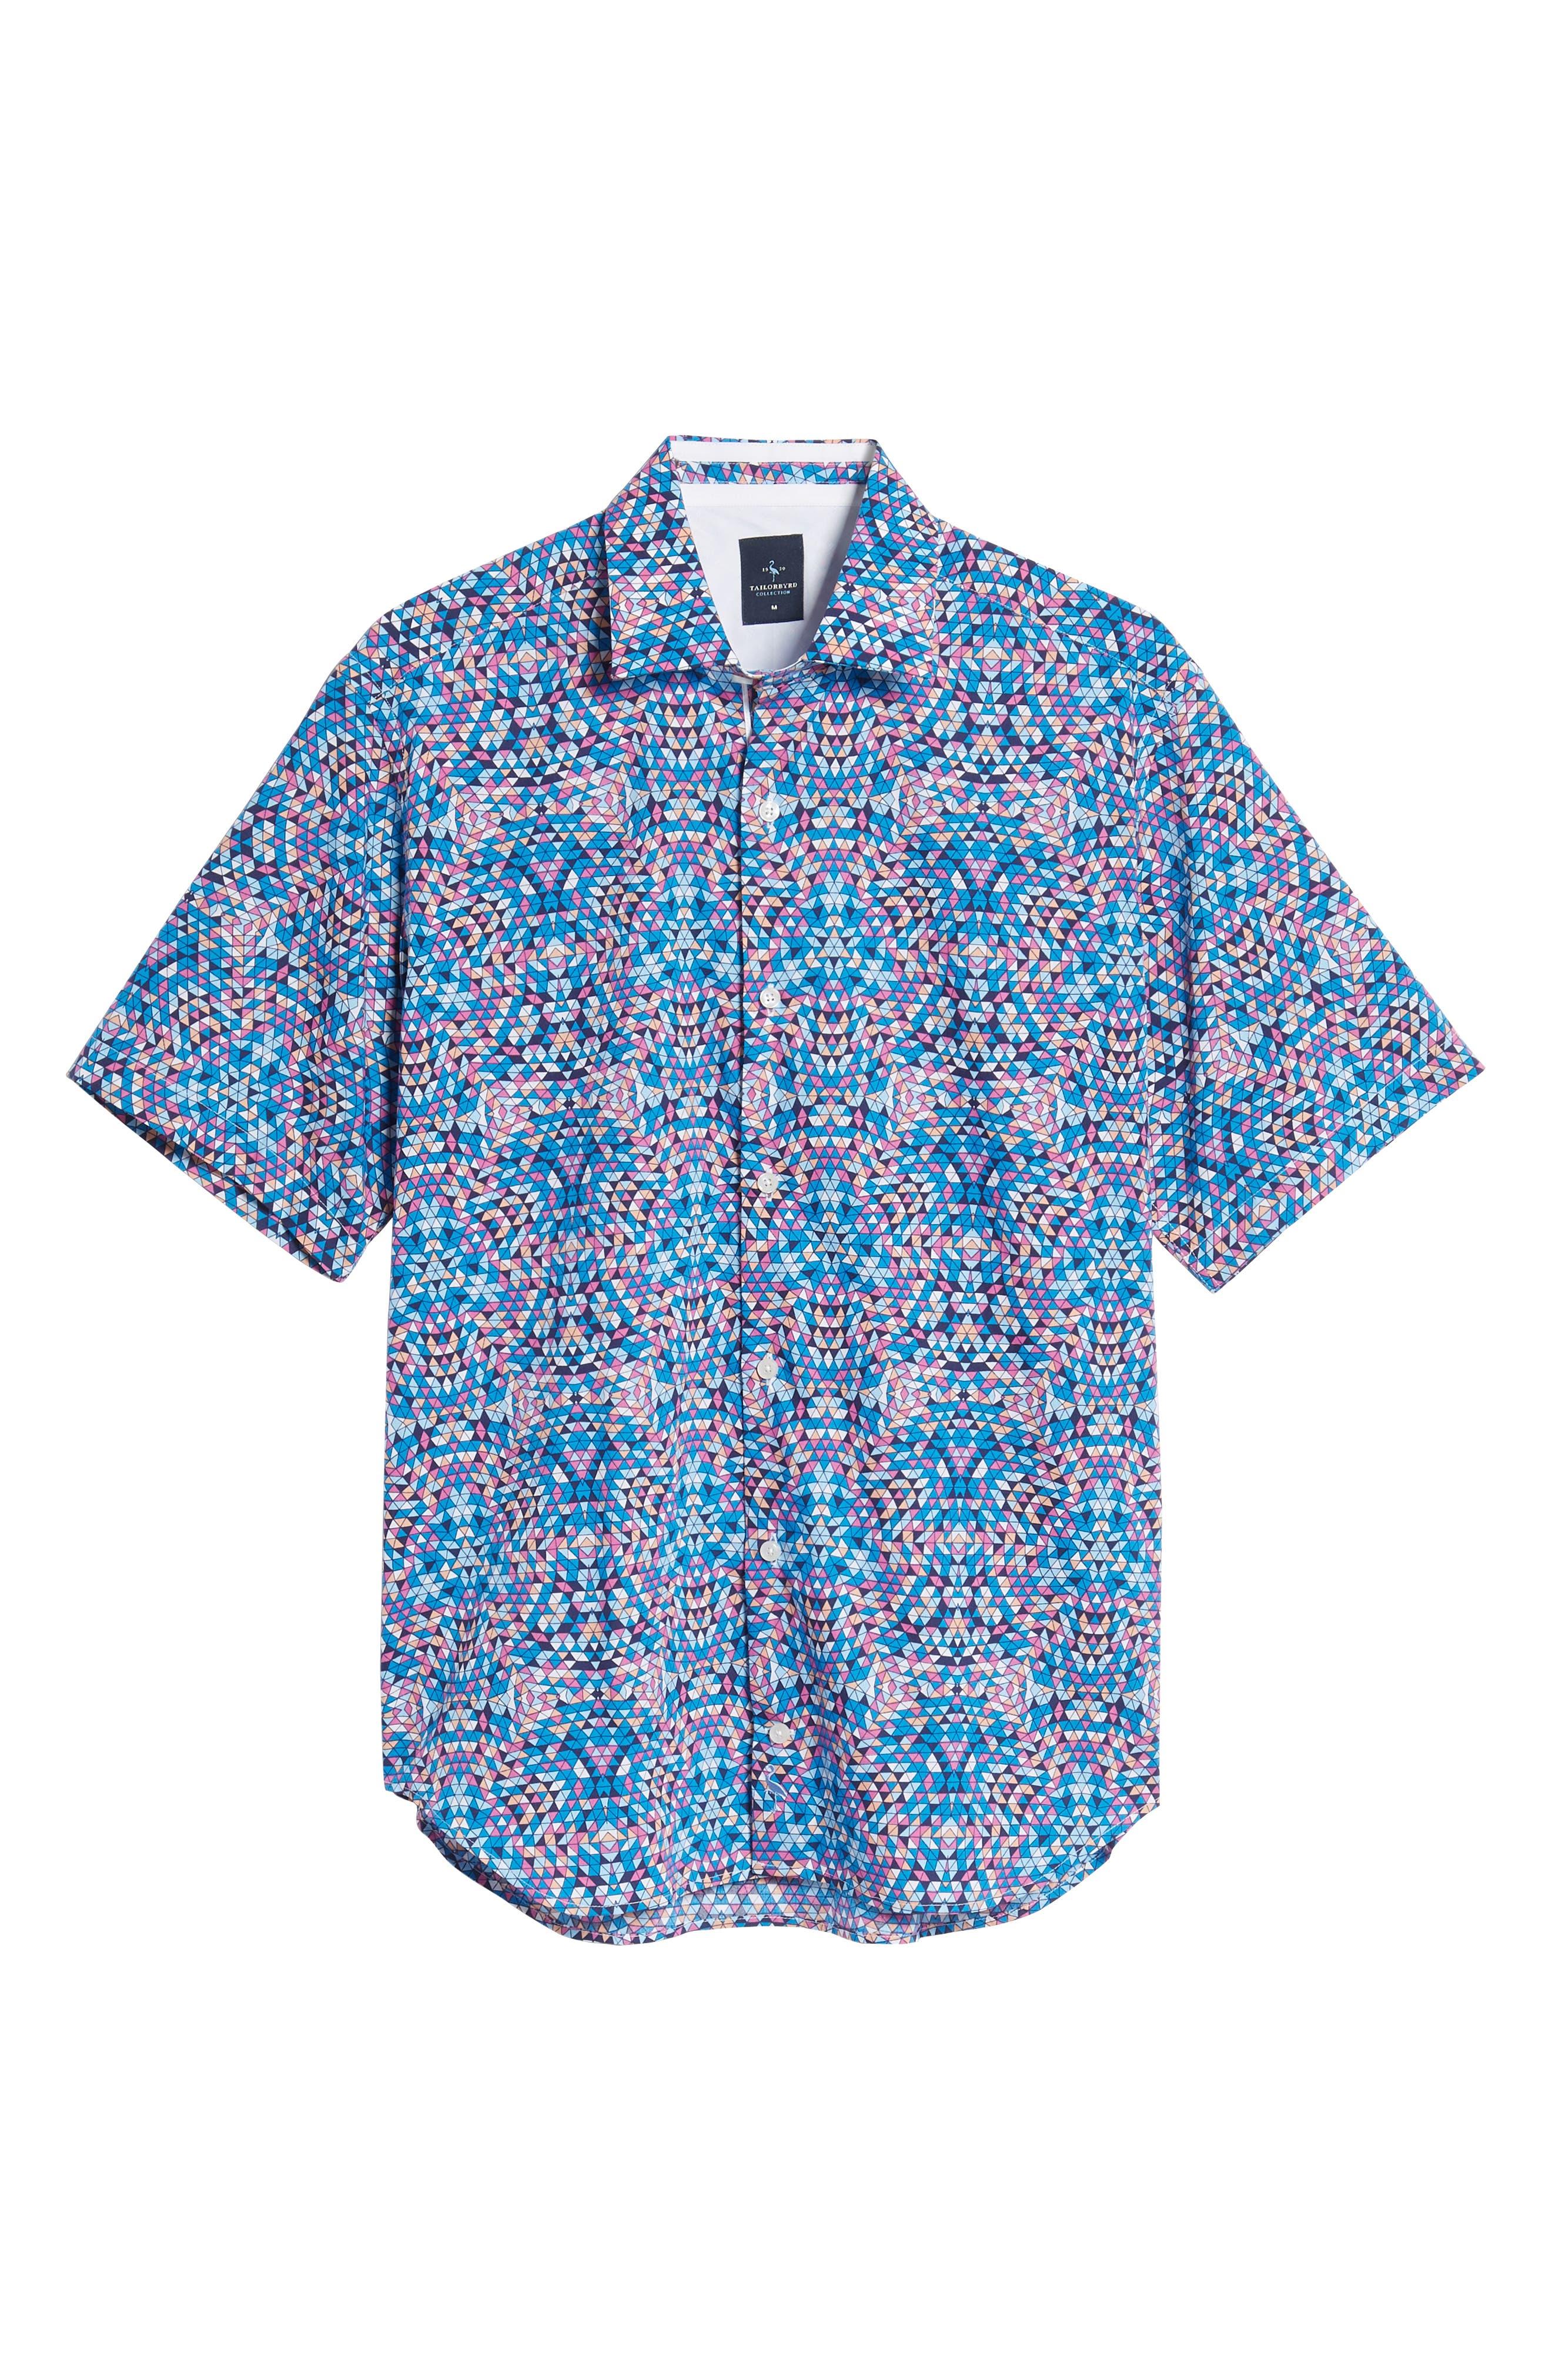 Anton Regular Fit Sport Shirt,                             Alternate thumbnail 6, color,                             Teal